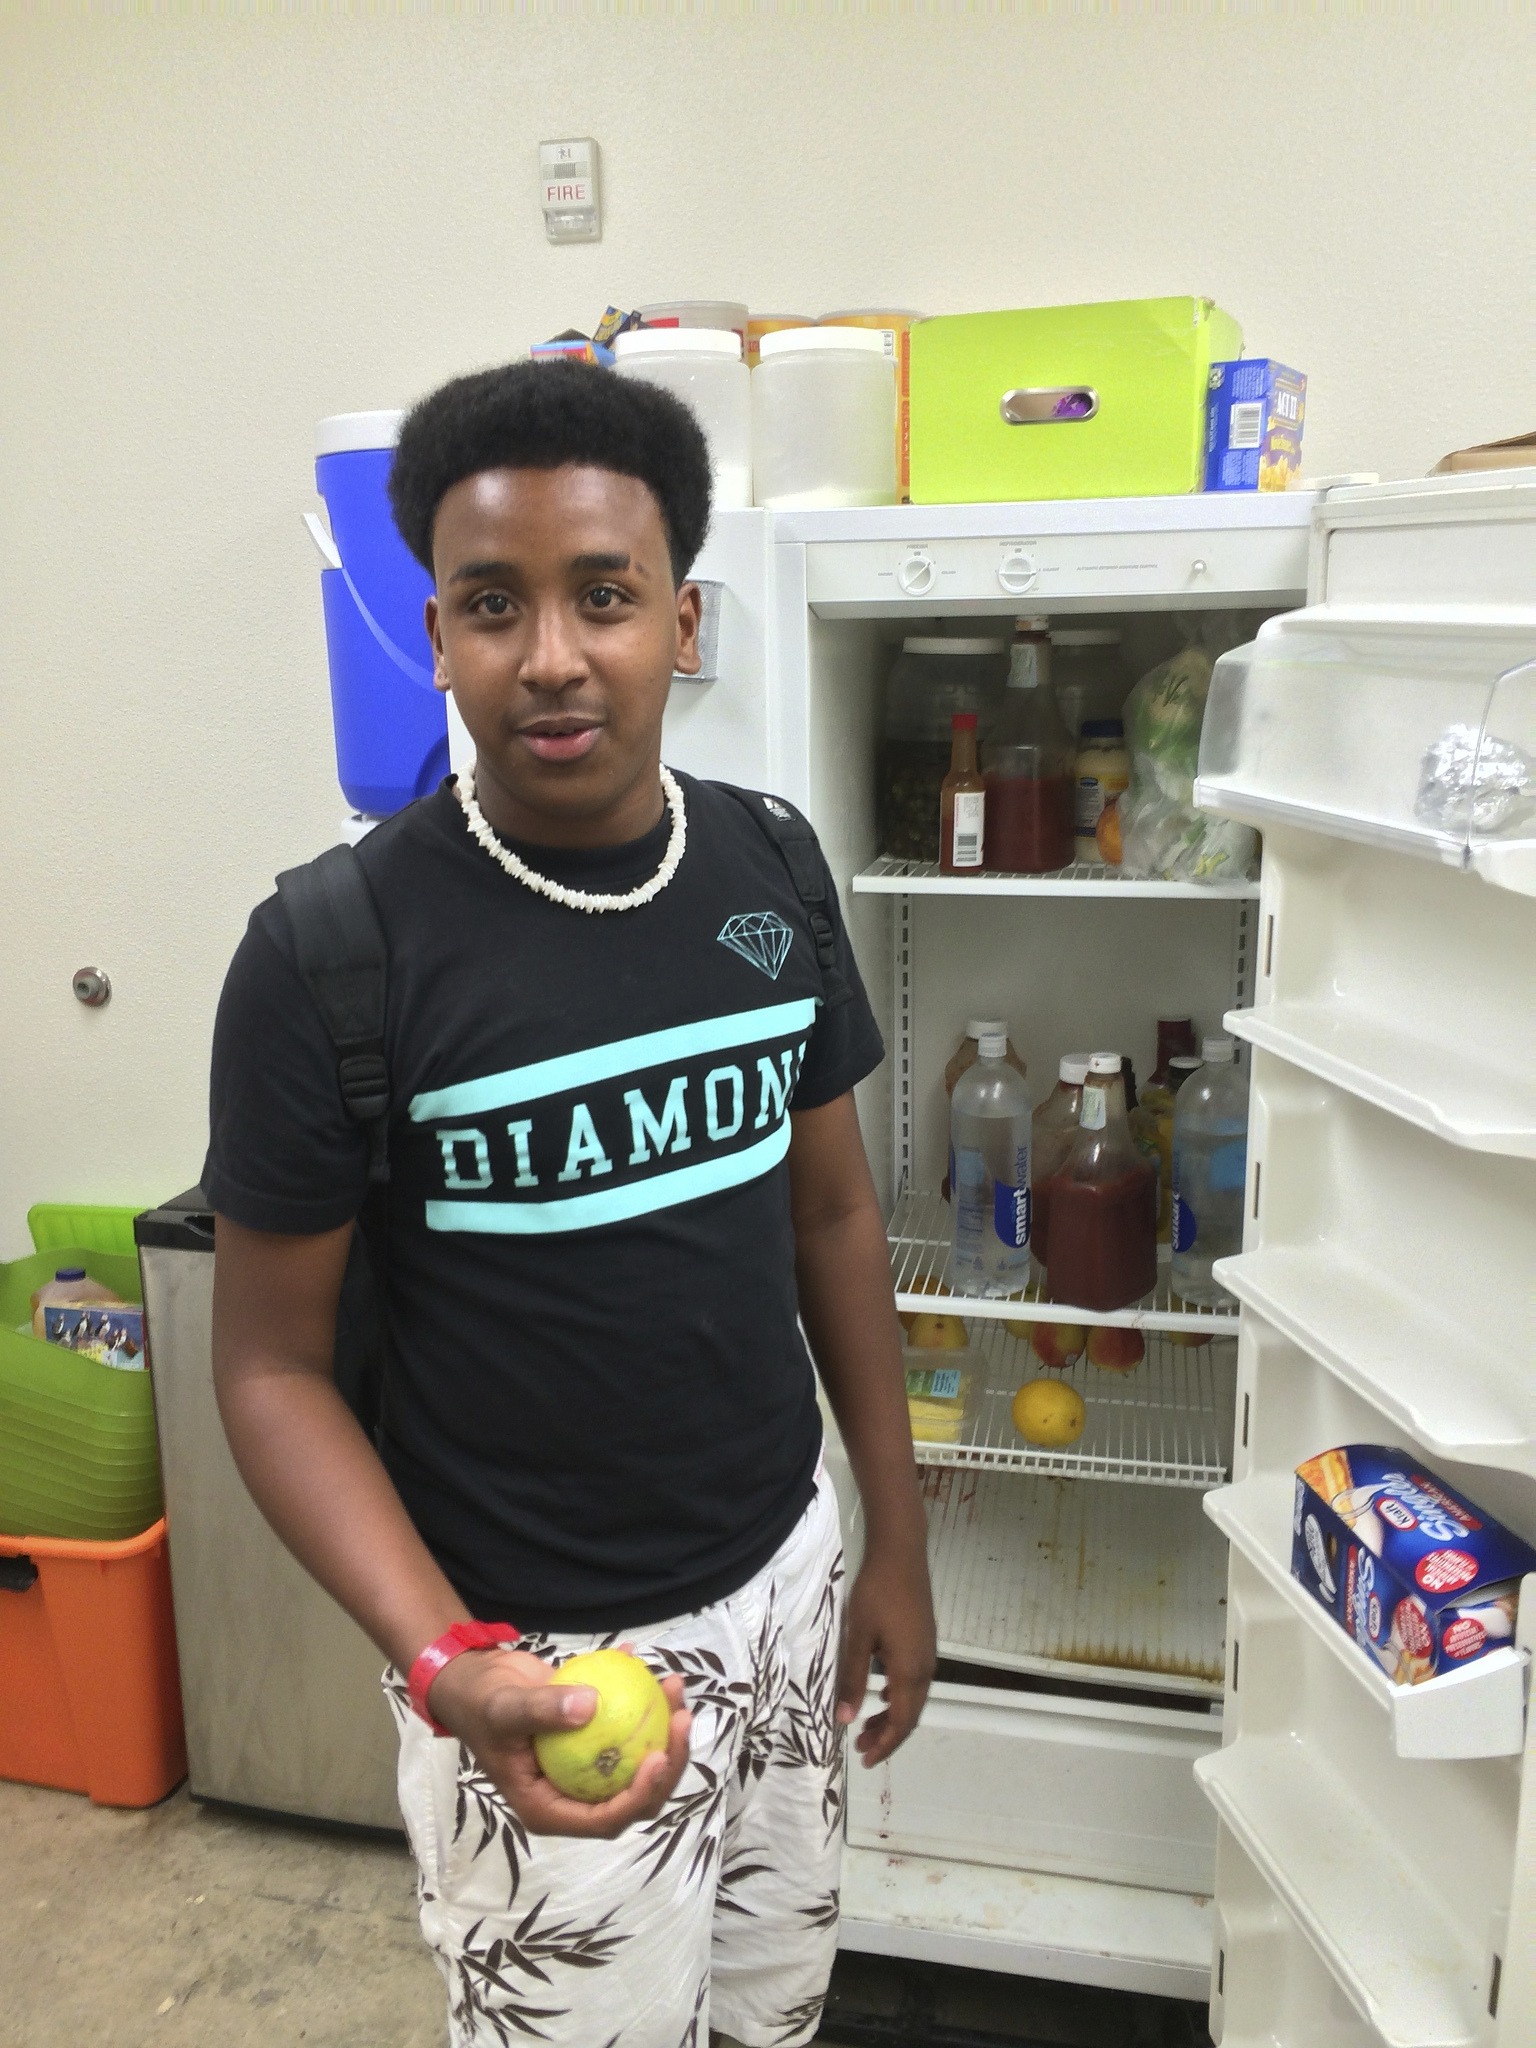 Dalon shows us the fridge